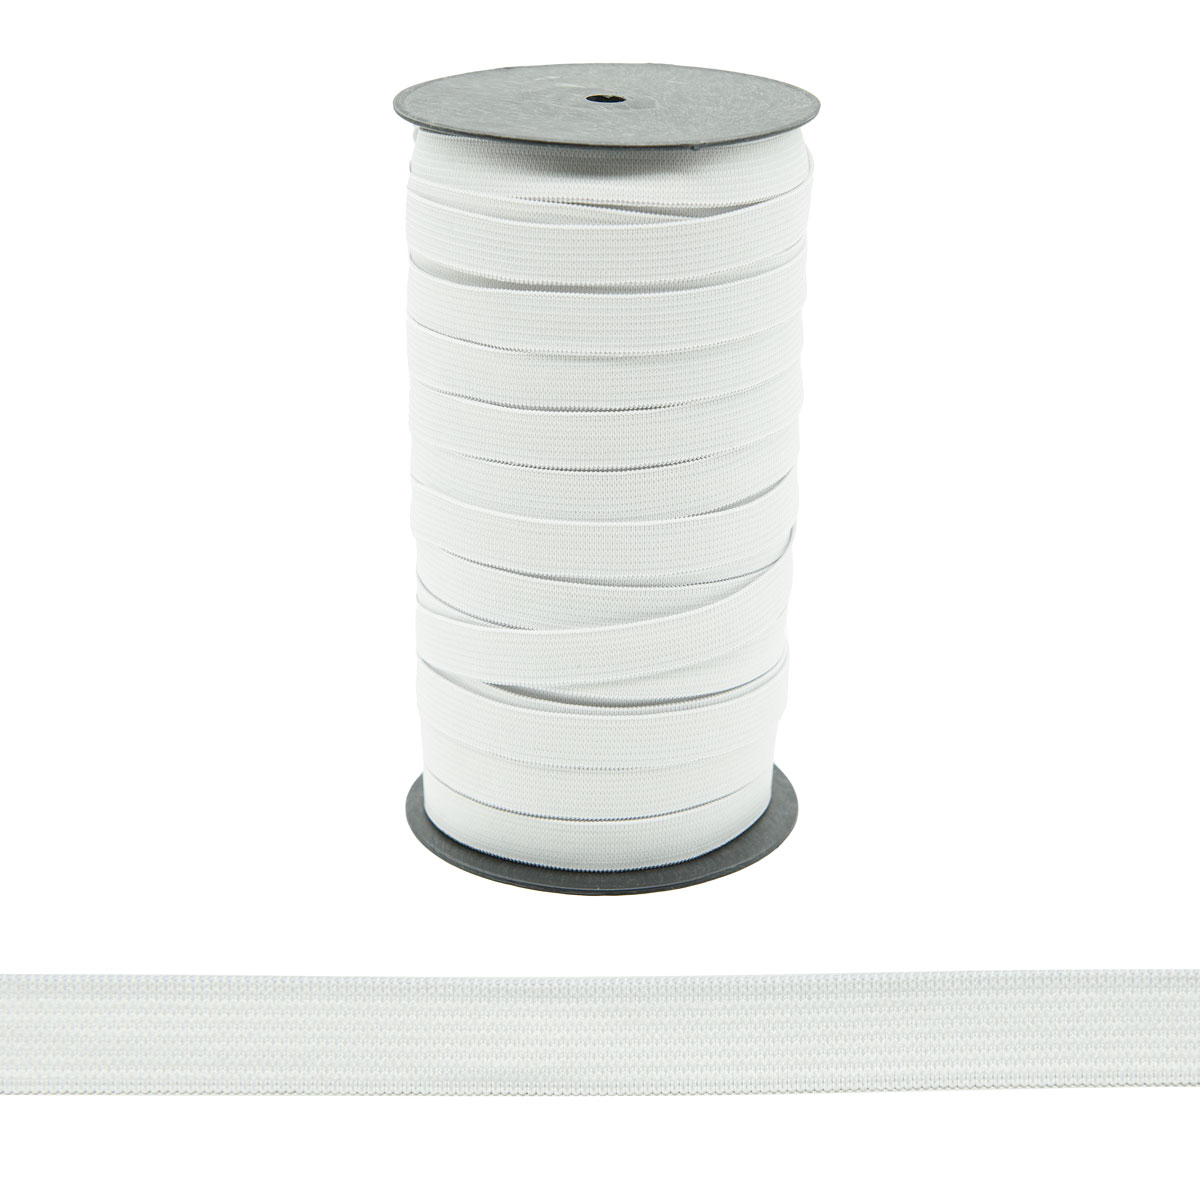 46-60315/15 Резинка вязаная 15мм экрю ГР